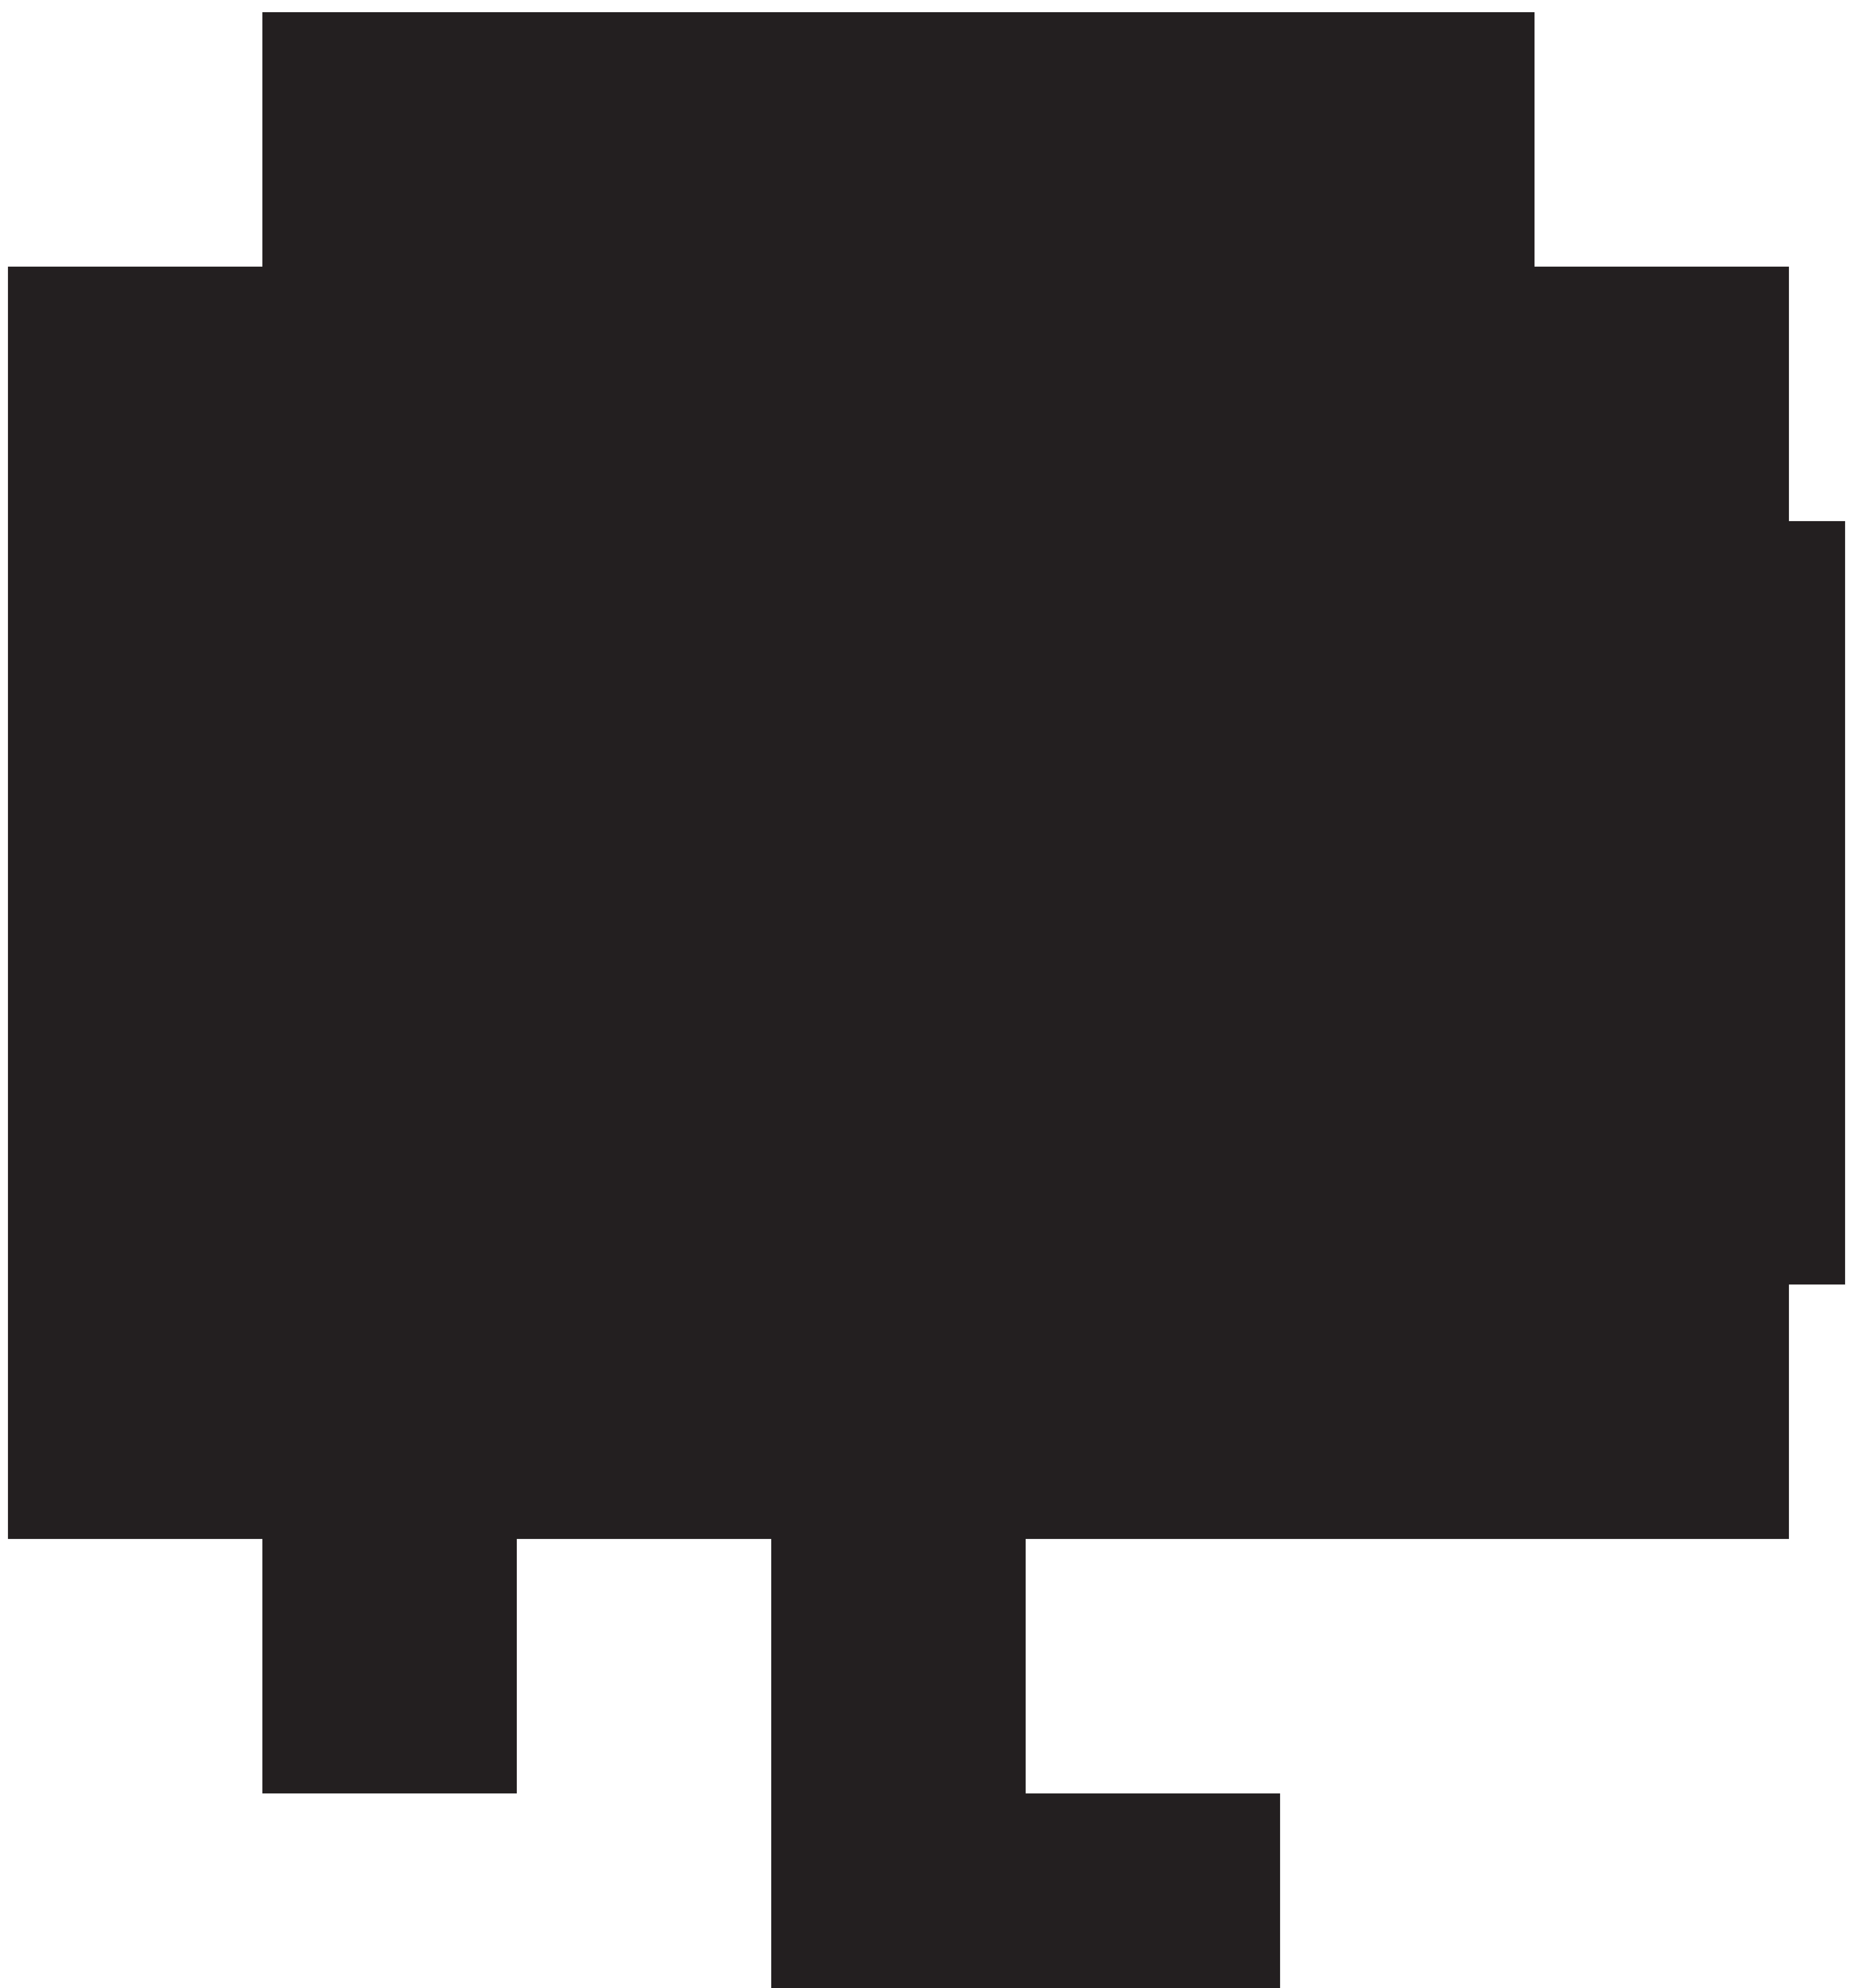 Grains clipart tree. Silhouette png clip art